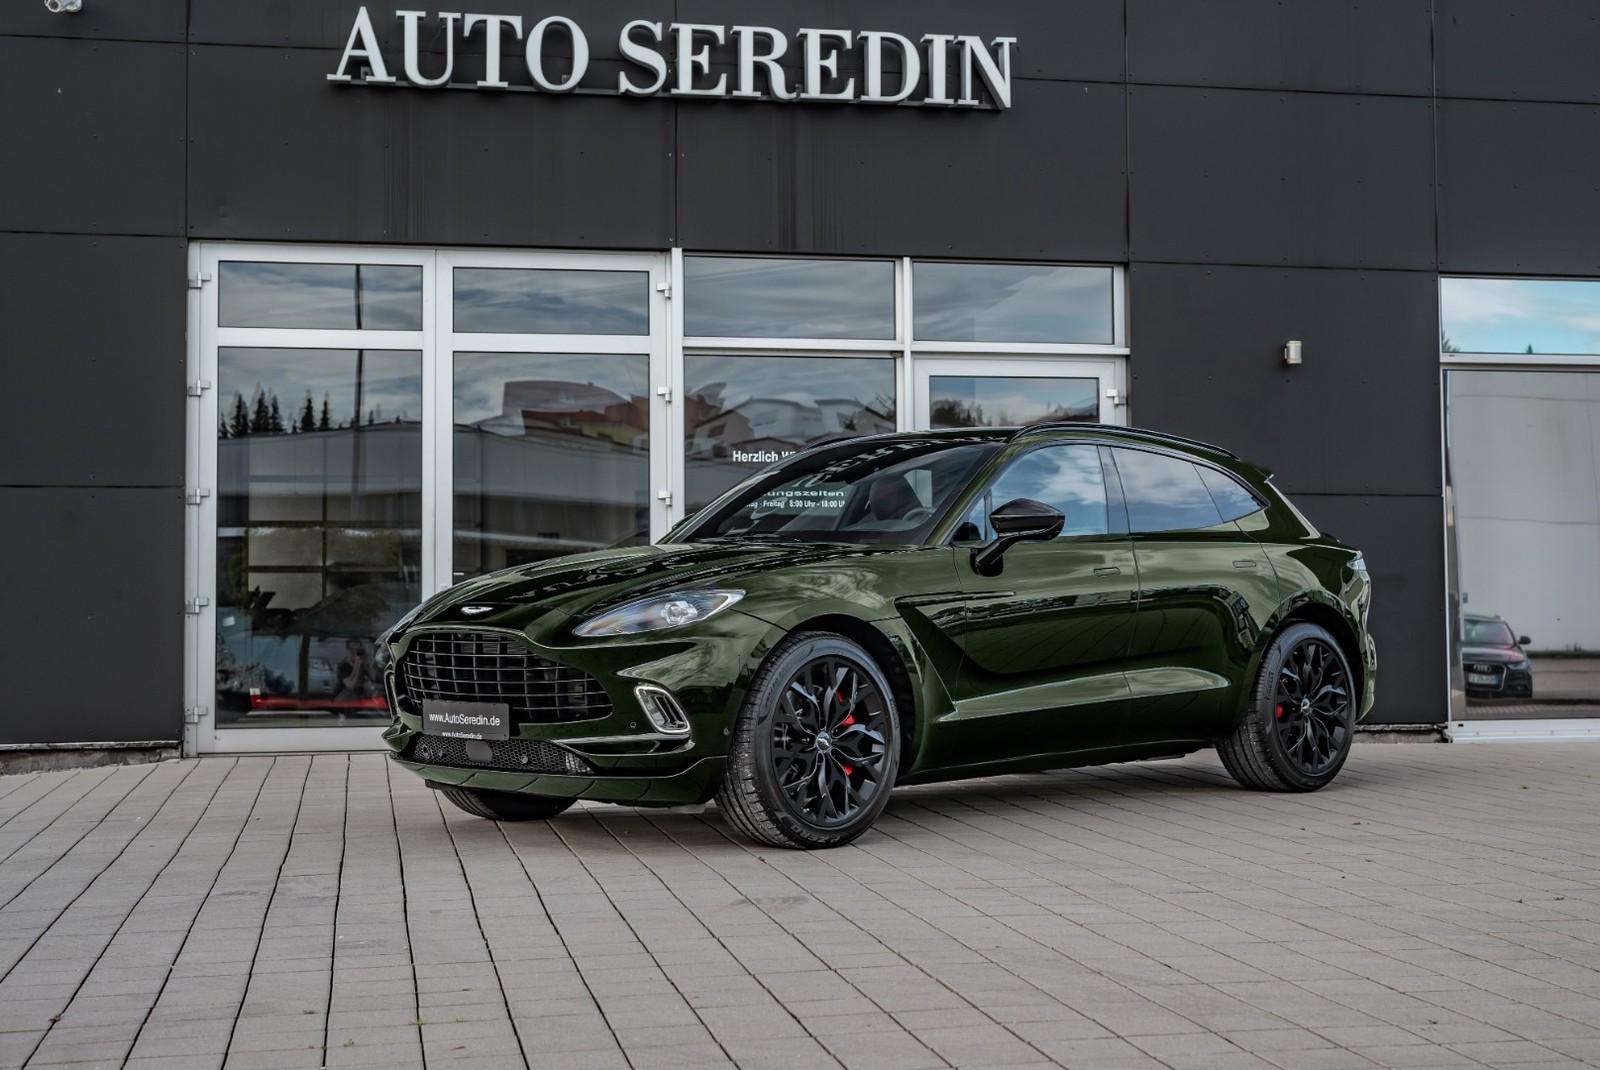 Aston Martin Dbx New Buy In Hechingen Bei Stuttgart Price 249400 Eur Int Nr 20 284 Sold